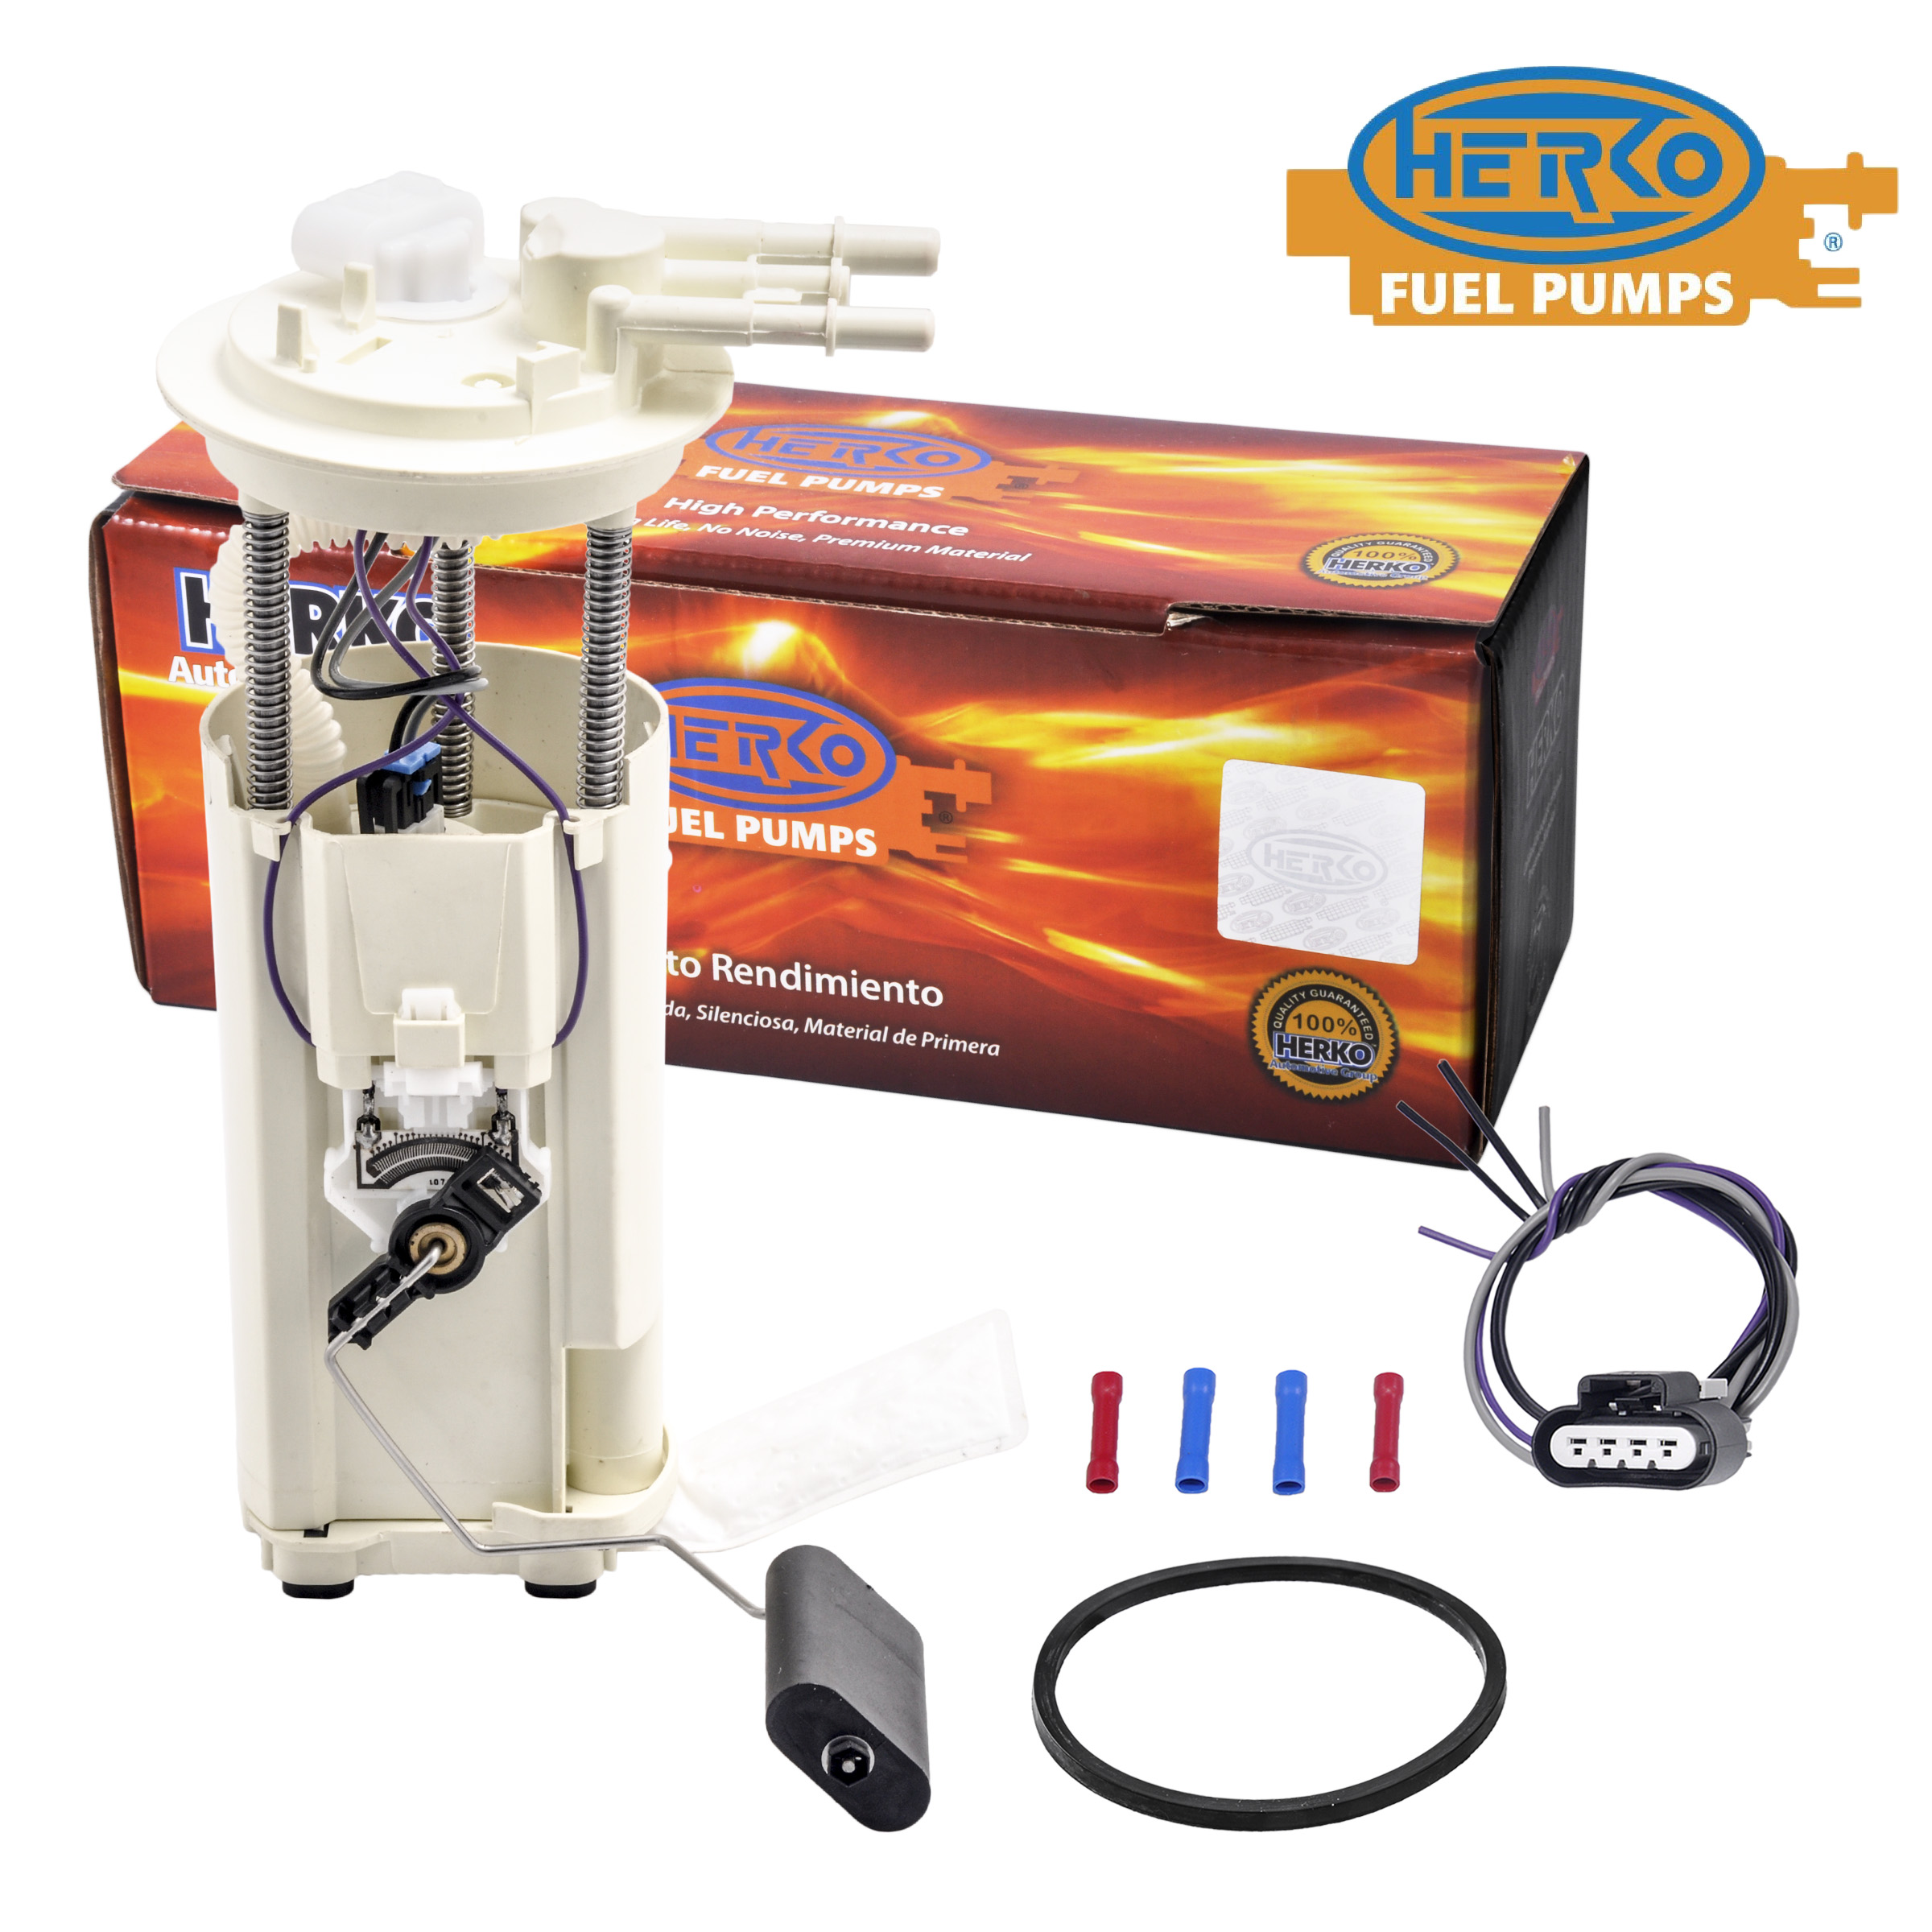 Fuel Pump Module Herko  241GE For Chevrolet Olds Pontiac 3.4L 2002-2005